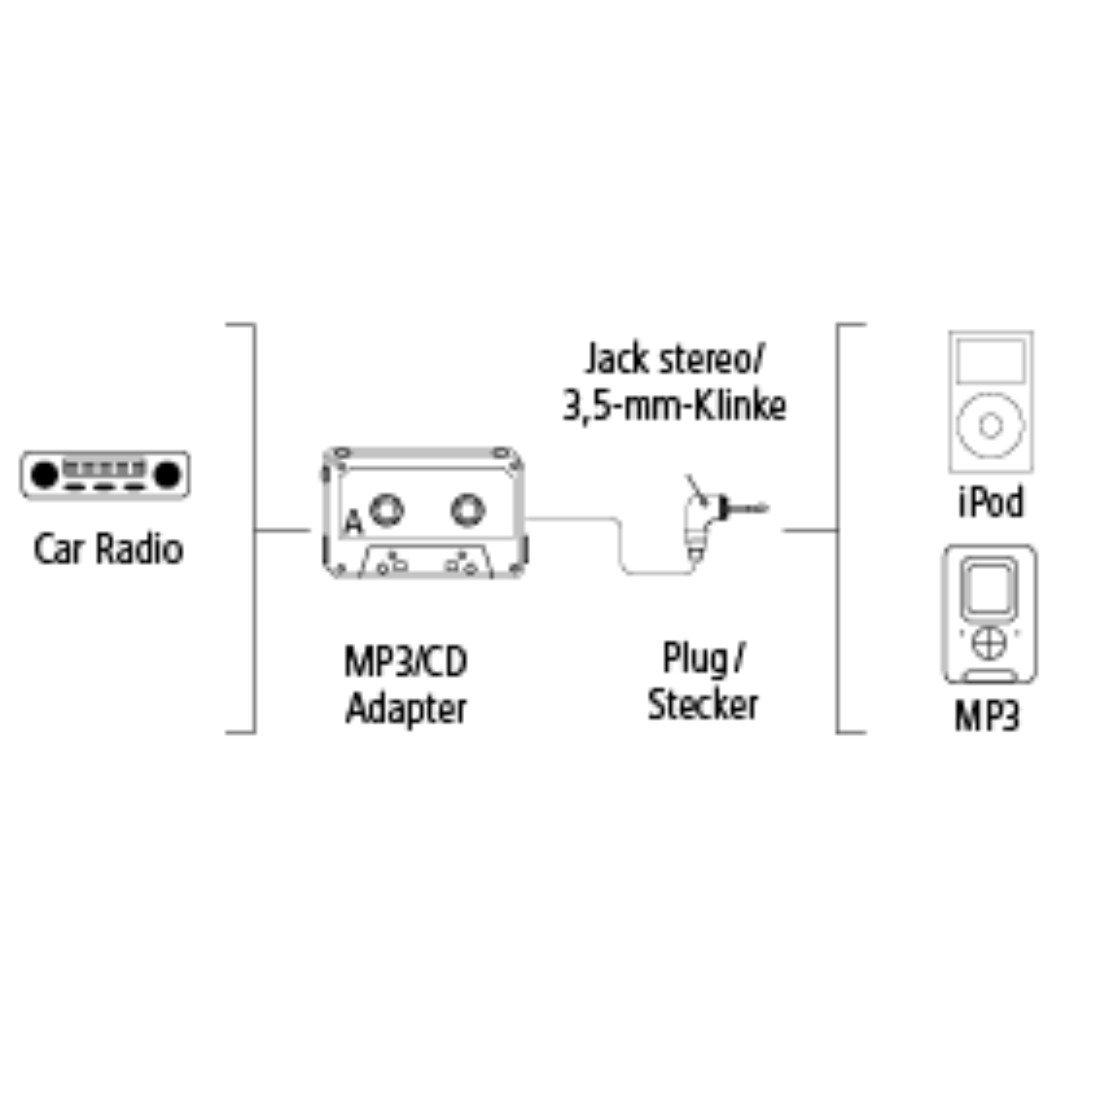 schwarz Smartphones//MP3-//CD-Player//iPod//Tablets am Autoradio, Tape mit 3,5 mm Klinkenstecker, Stereo Hama KFZ-Kassettenadapter